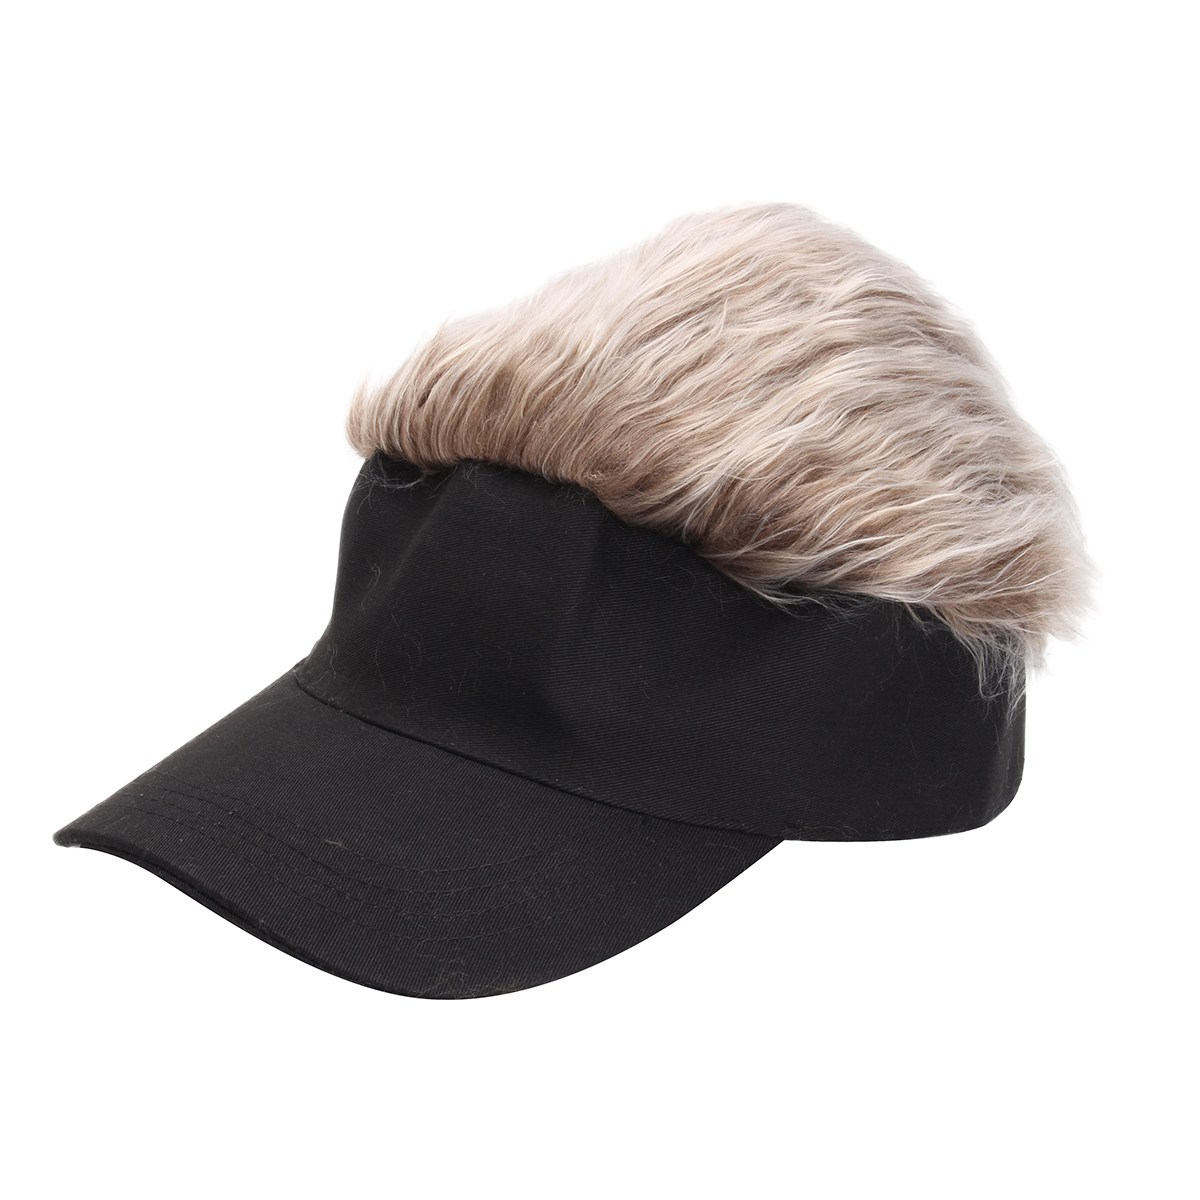 Newest Novelty Baseball Cap Wig Cap Women Men Fake Flair Hair Visor Sun Hat  Toupee Funny Hair Snapback Hats Casquette Cool Gift 80555ddad9b